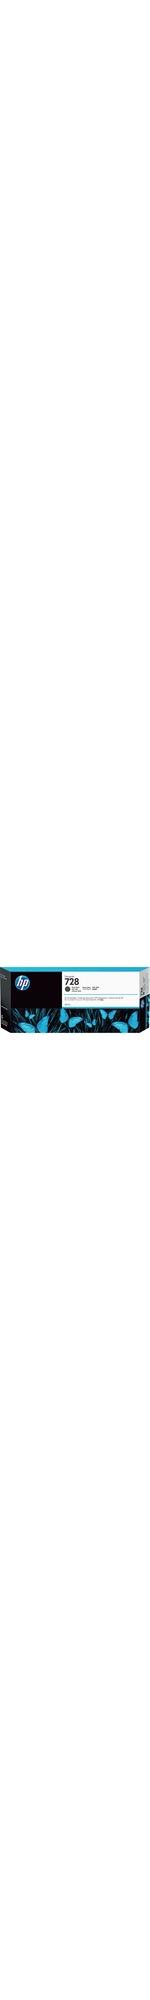 HP 728 Original Ink Cartridge - Matte Black - Inkjet